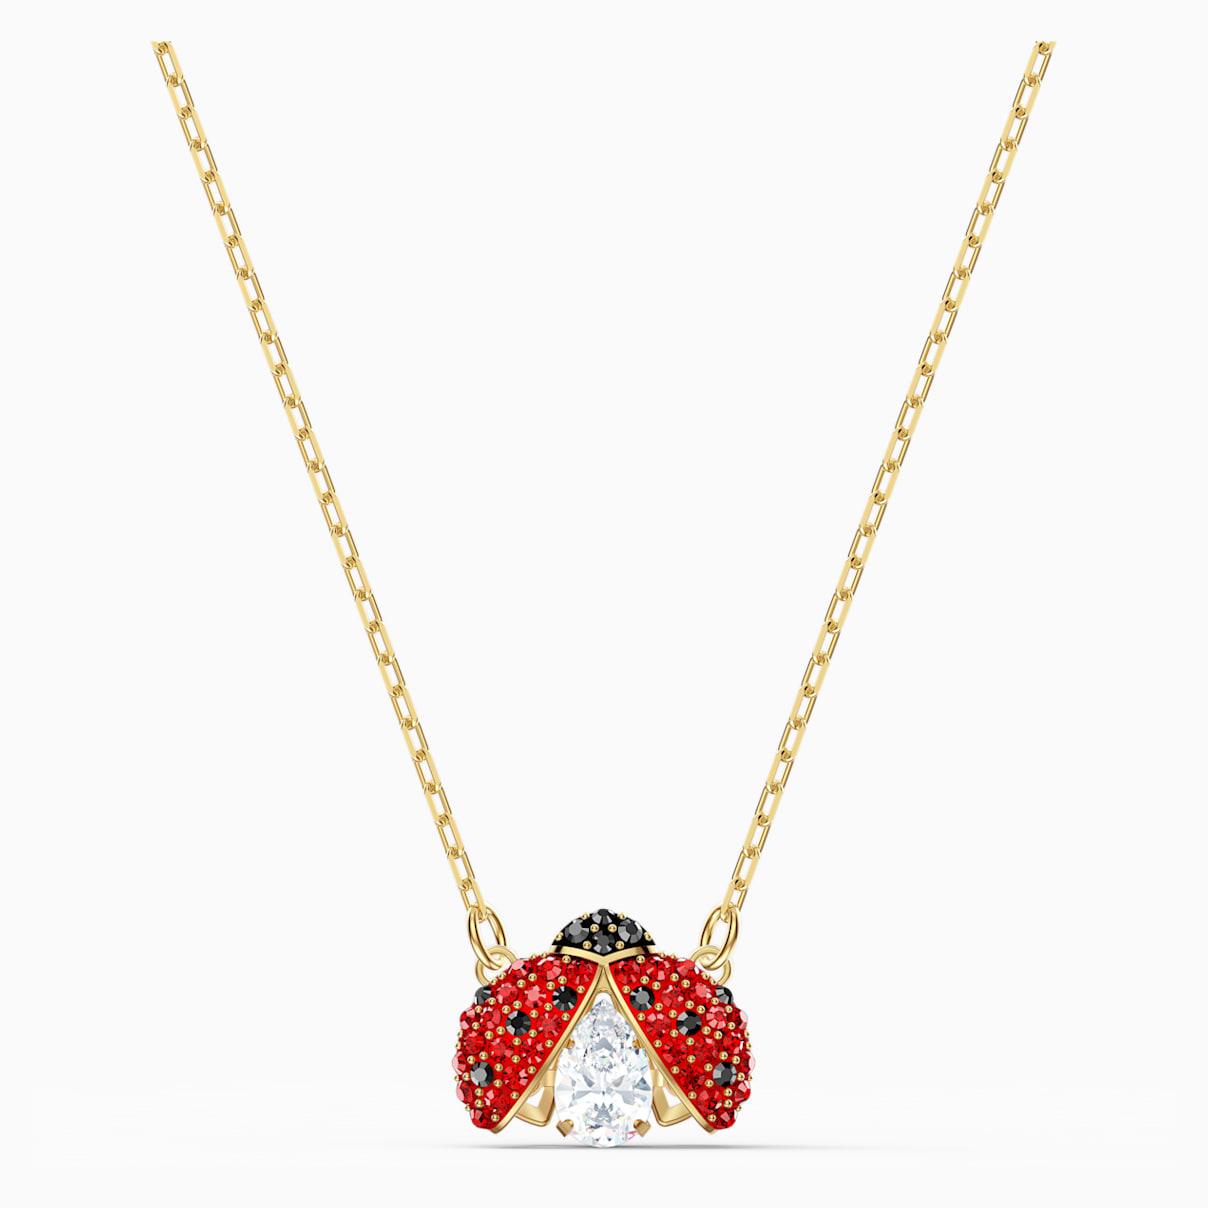 Swarovski Sparkling Dance Ladybug Necklace, Red, Gold-tone plated